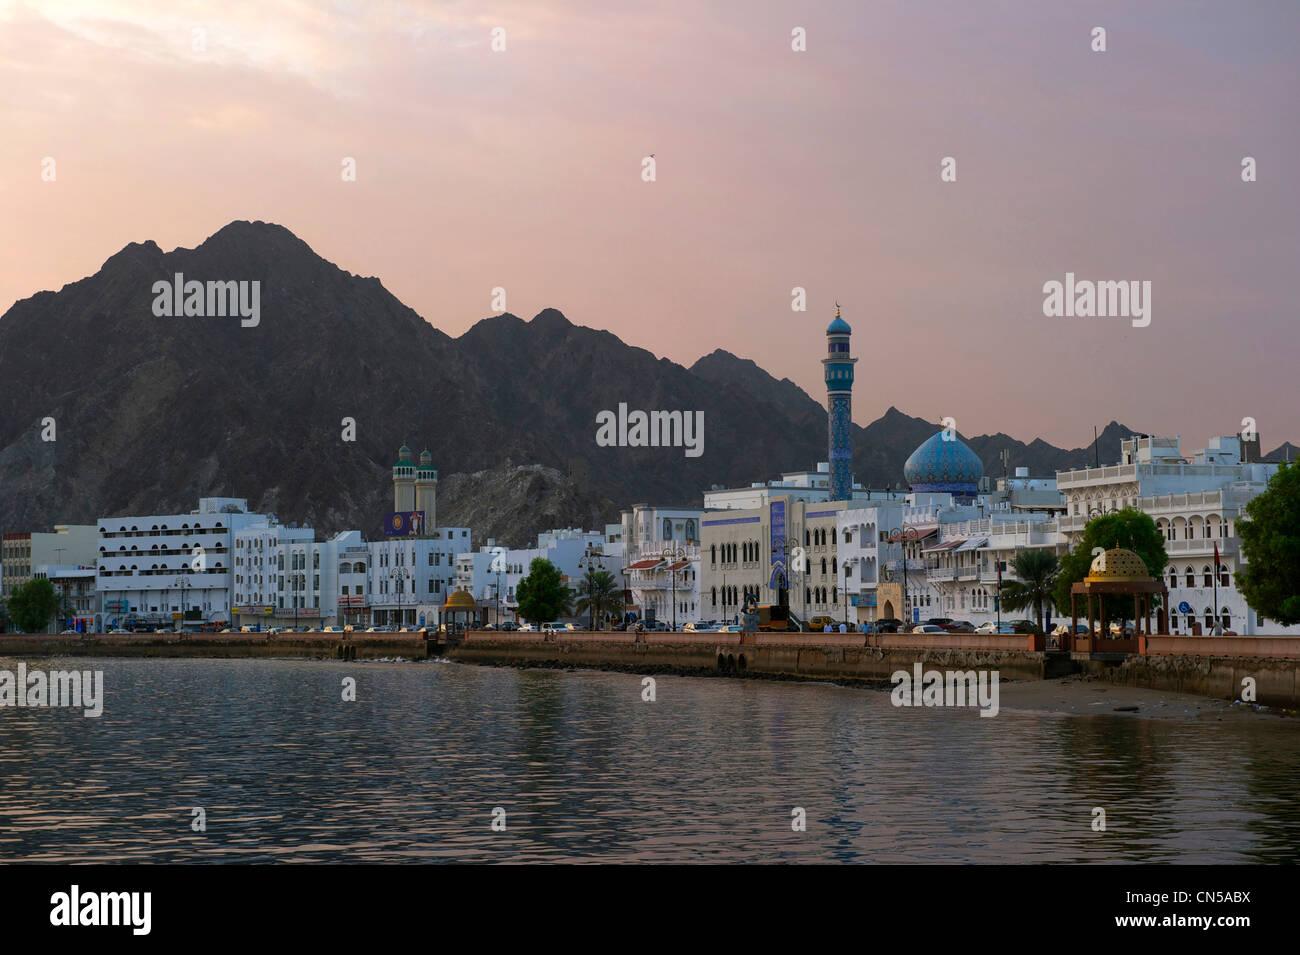 Sultanate of Oman, Muscat, Muttrah corniche - Stock Image